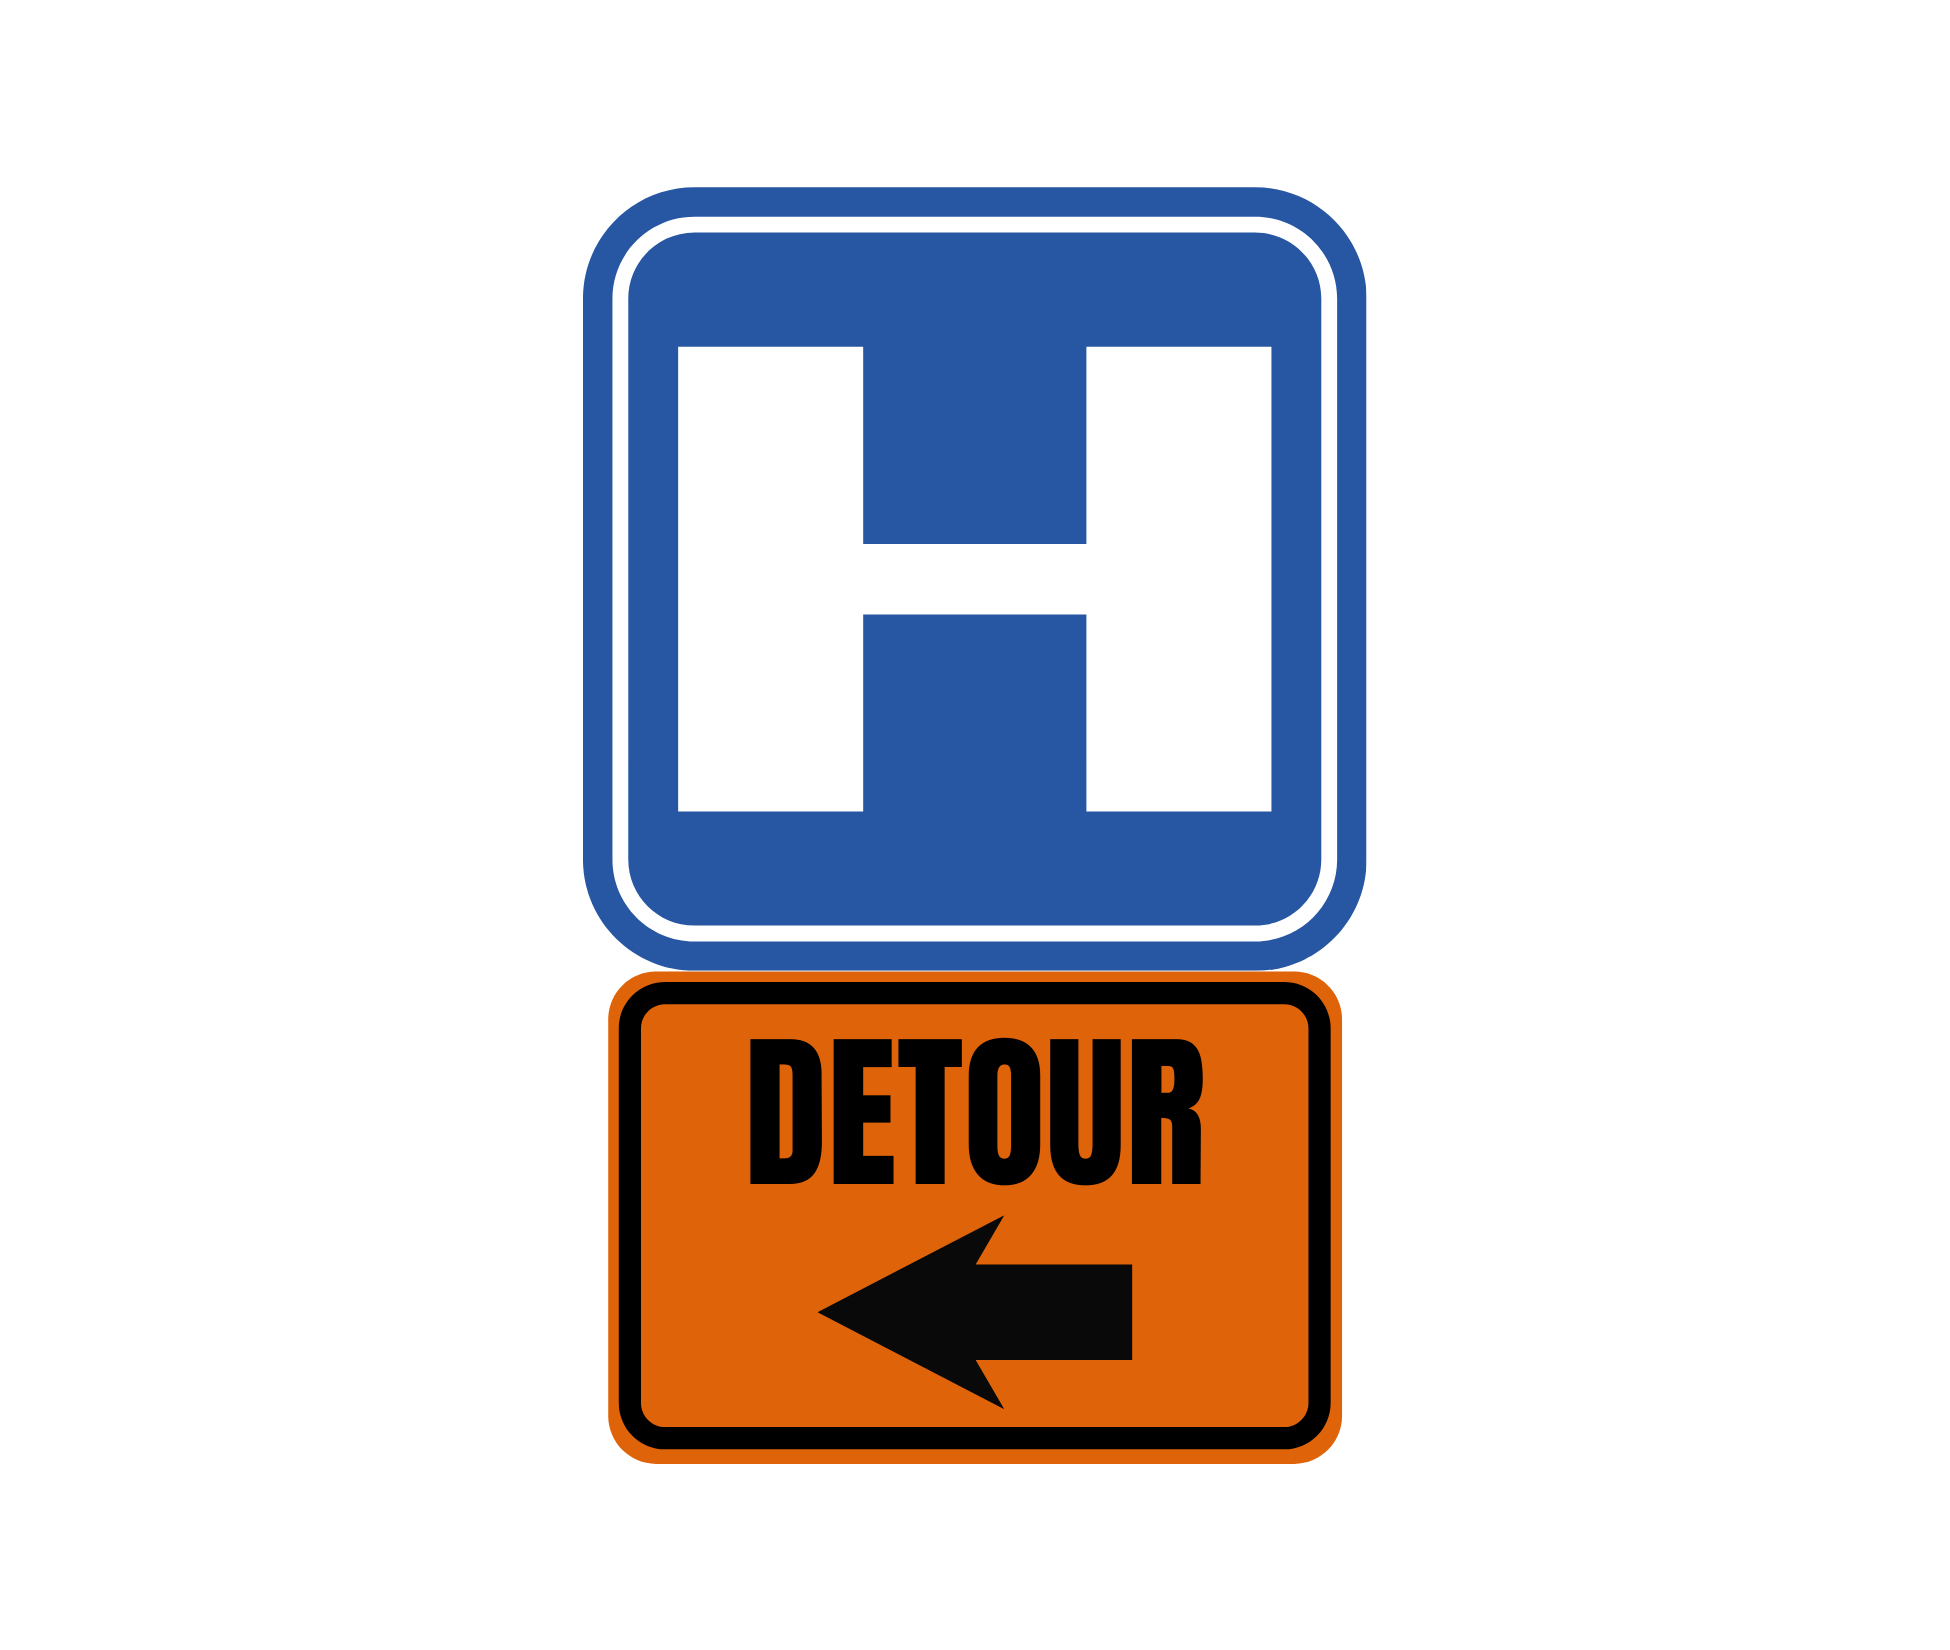 Dosher Detour Sign